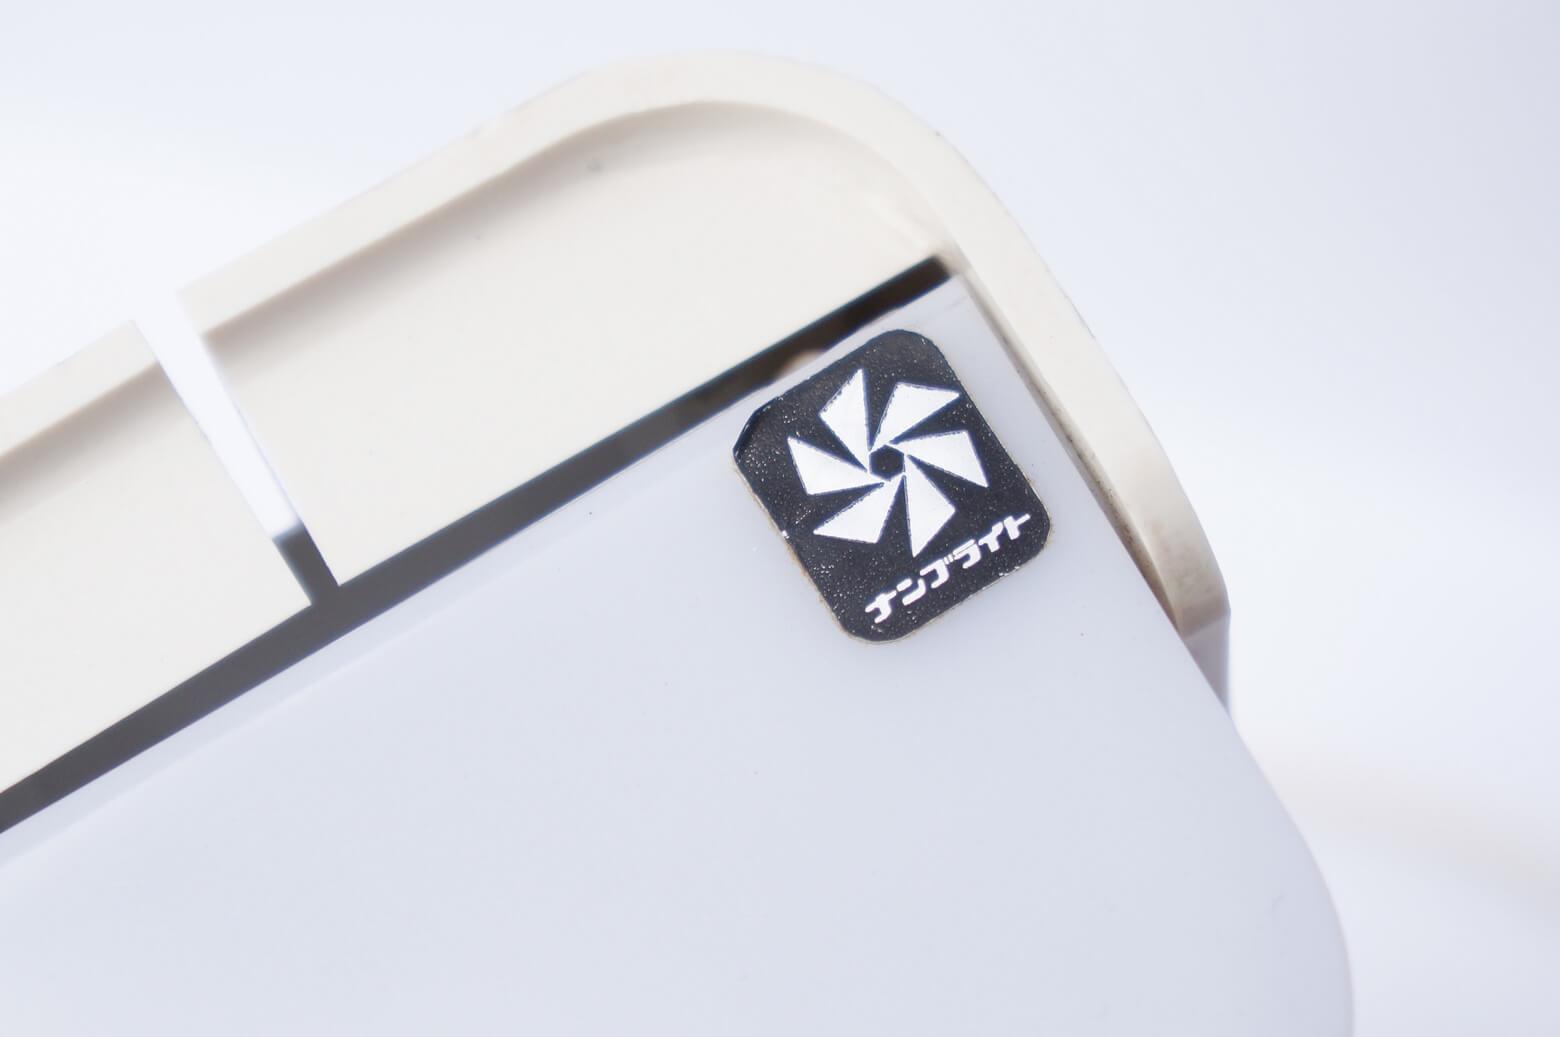 "NANBU LIGHT ""L"" NA-417 Japan Vintage/ナンブライト ""エル"" 卓上 デスク ライト レトロ 南部工業株式会社 グッドデザイン賞"